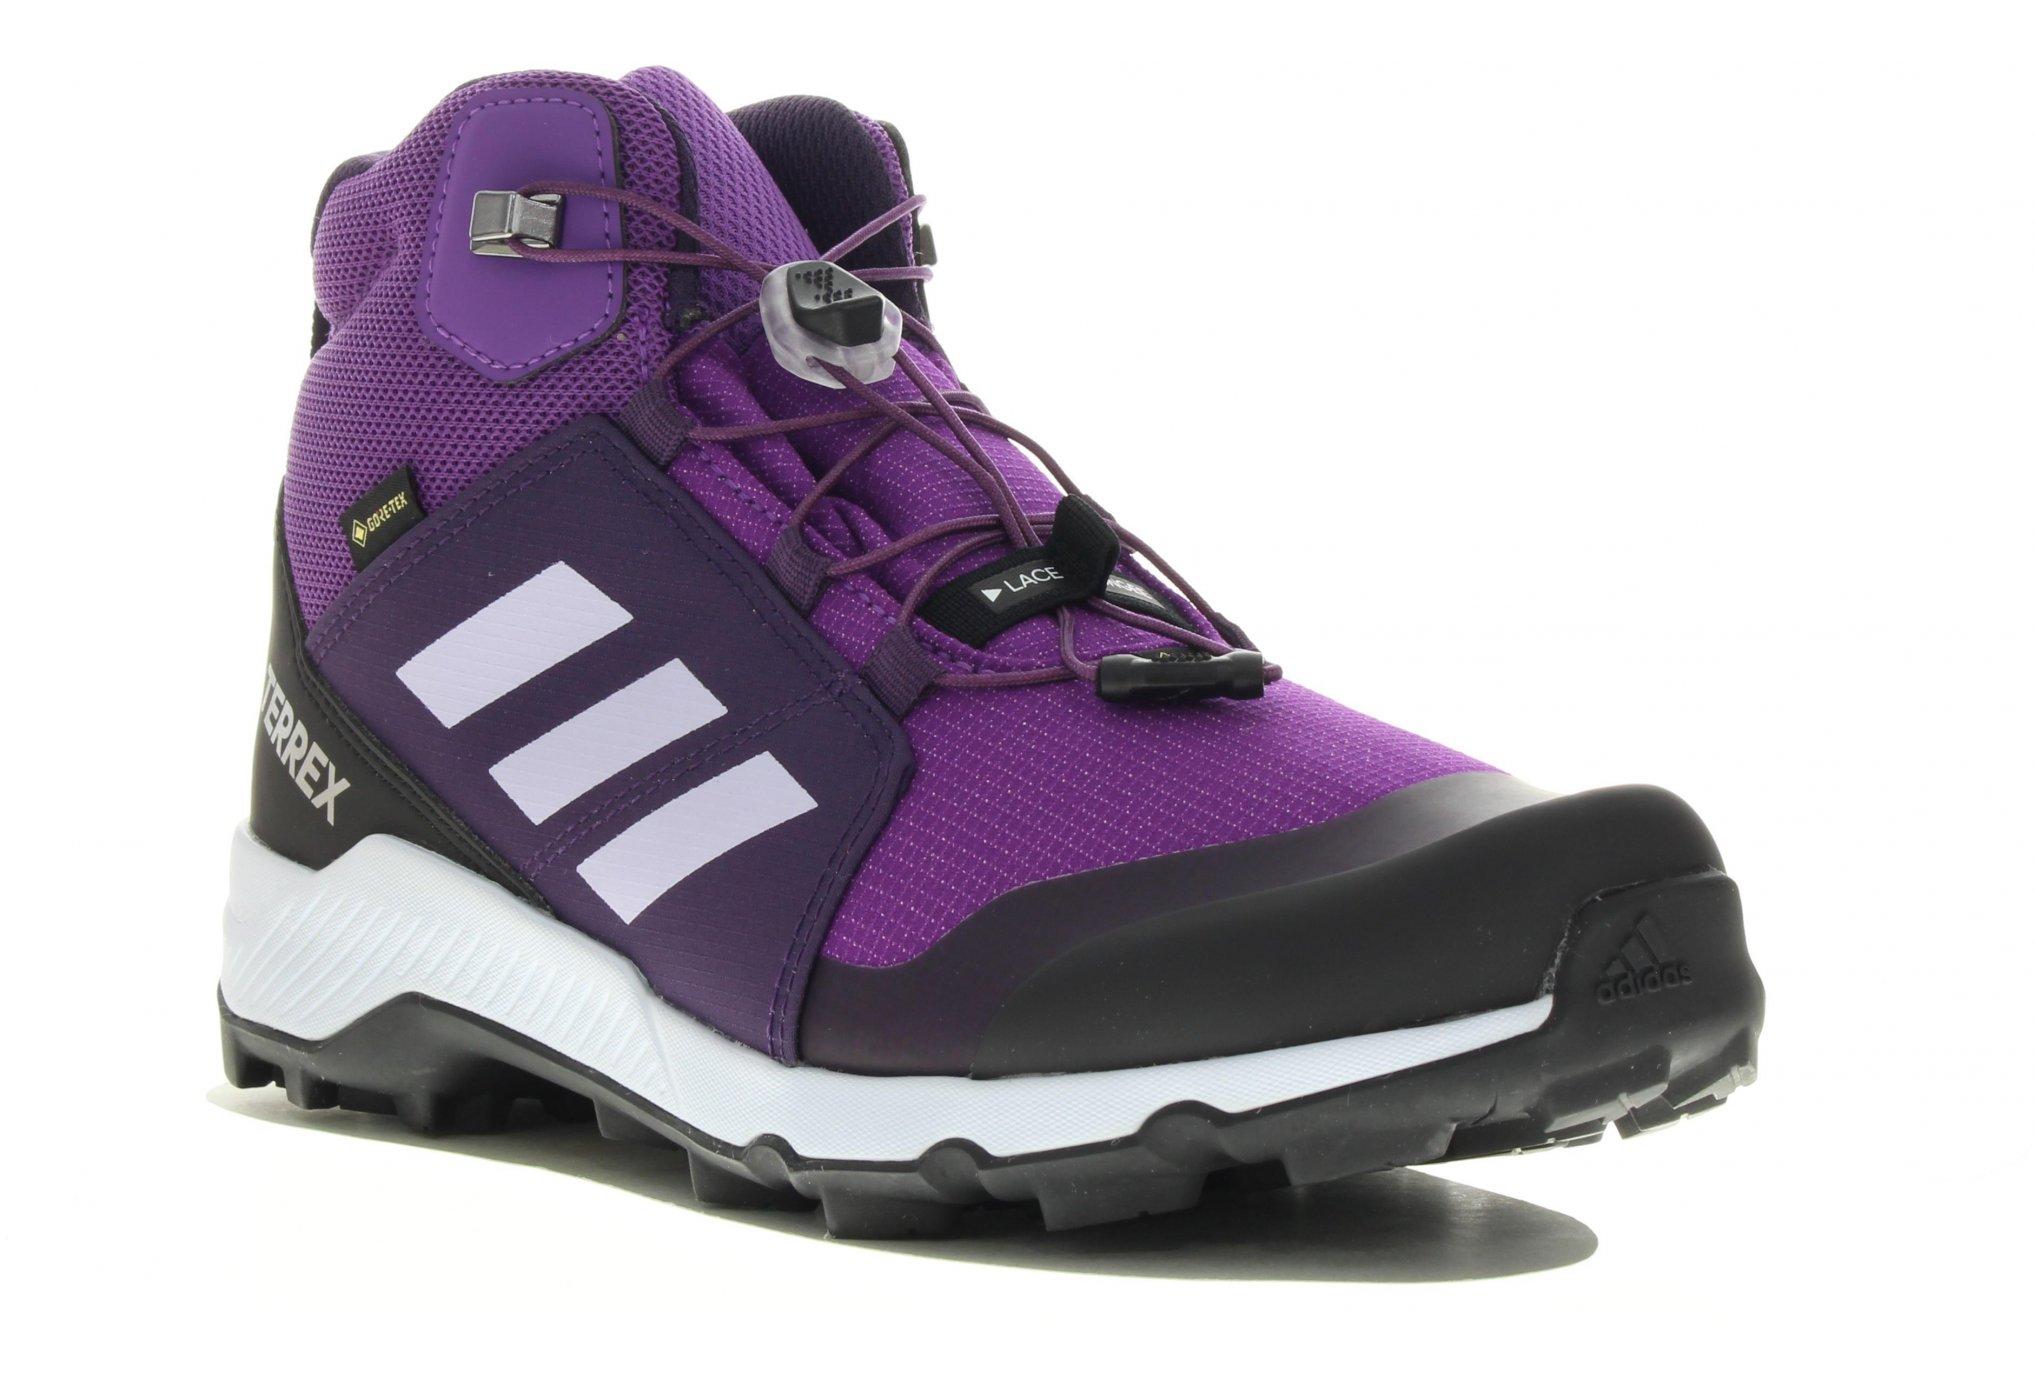 adidas Terrex Mid Gore-Tex Fille Chaussures running femme